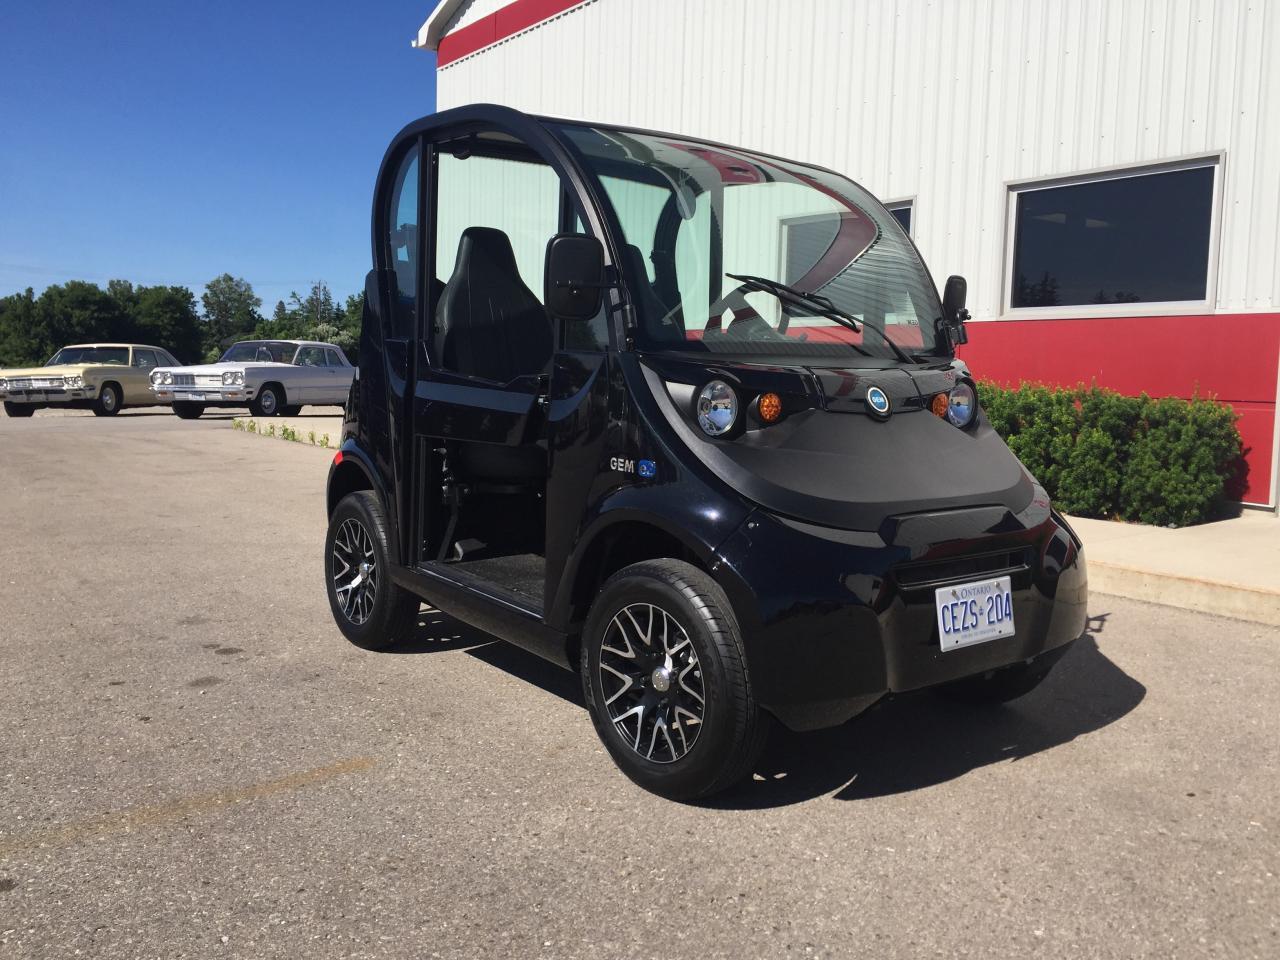 2018 GEM E825 e2 Low Speed Vehicle